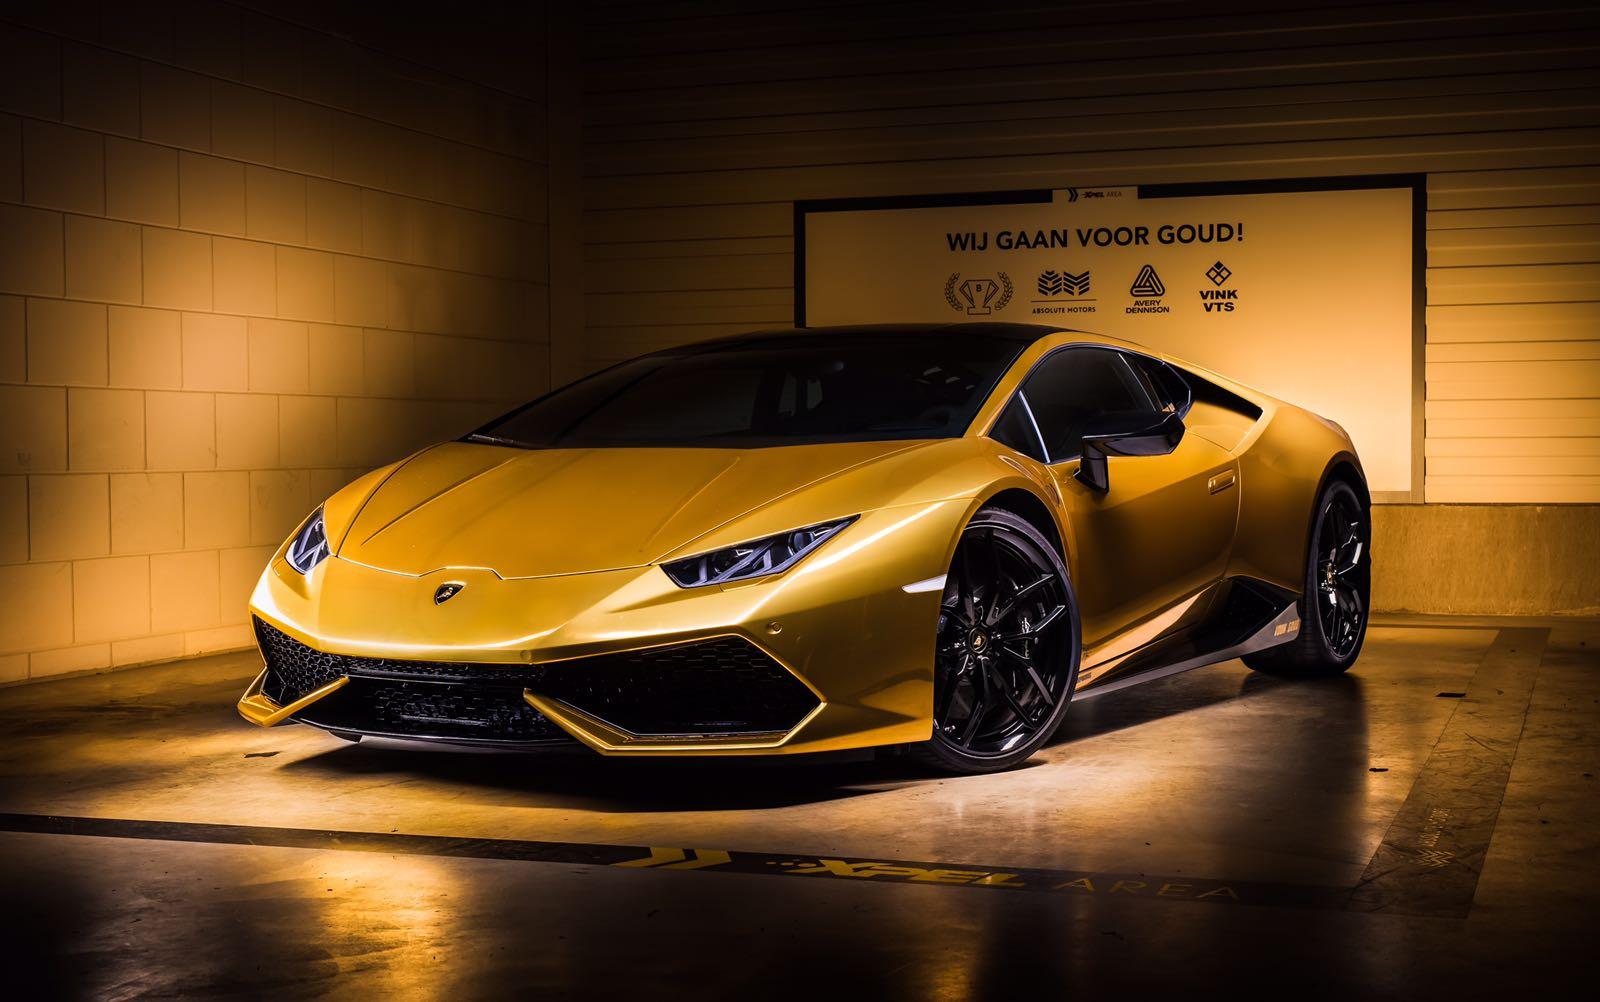 Joel Beukers Laat Z N Lamborghini Hur 225 Can Goud Wrappen Fhm